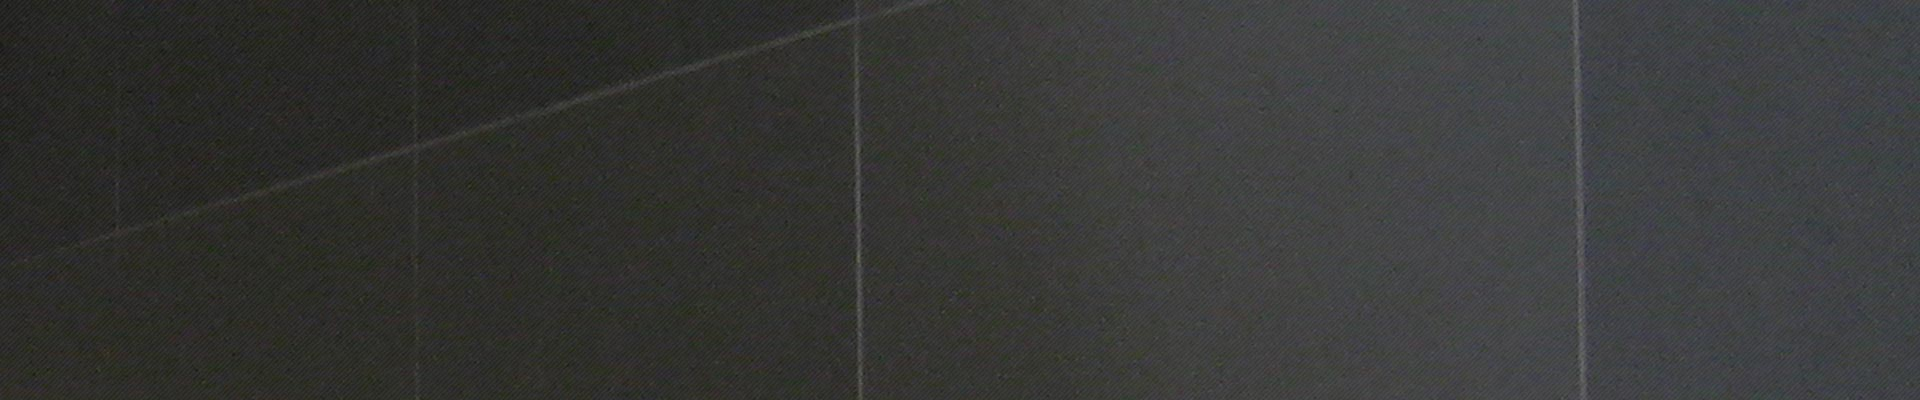 Current Flooring Trends: Benefits of Large Format Tiles